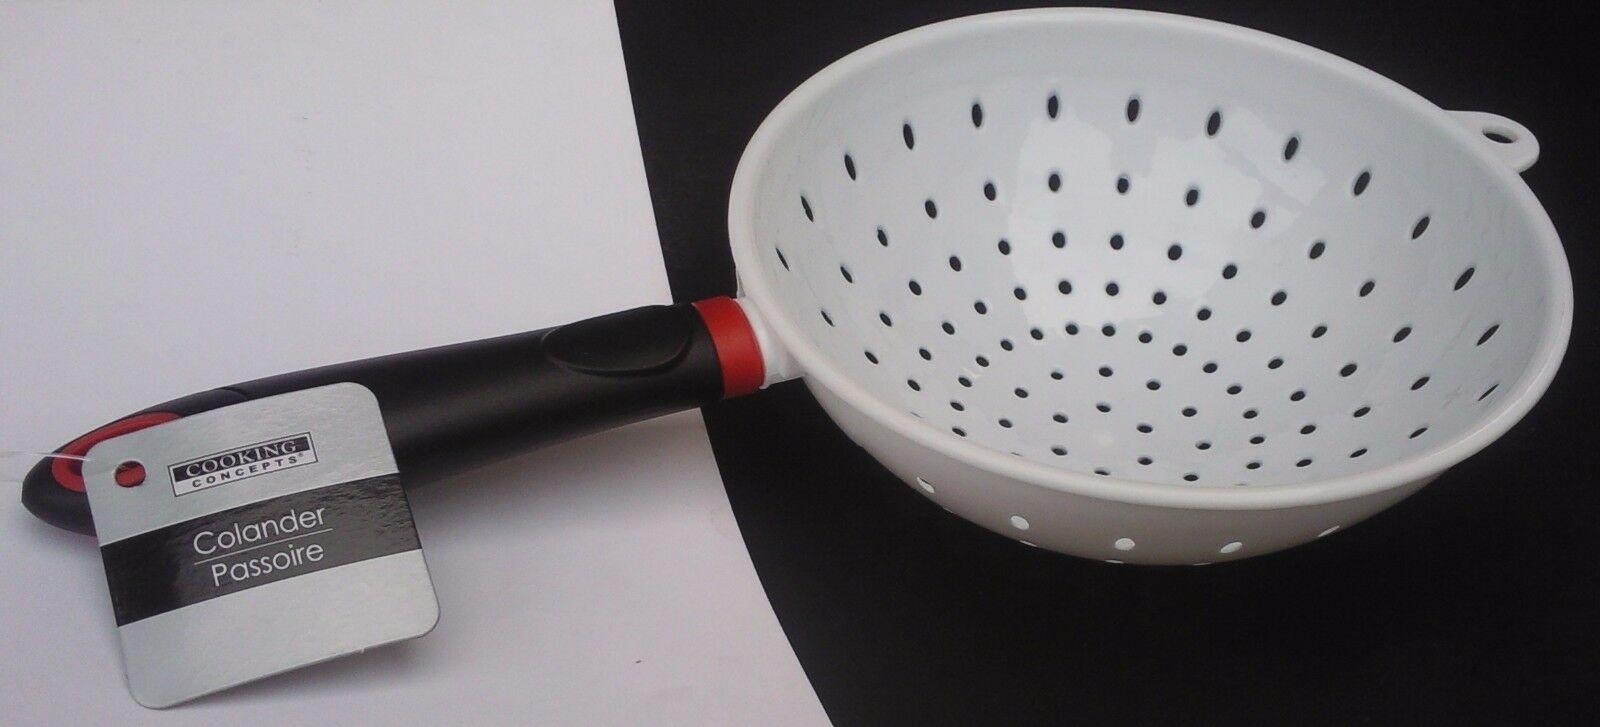 Kitchen Colander Strainer White Plastic 7 Basket 5 5 Handle Pasta Vegetables 639277965370 Ebay In 2020 Colanders Strainers Strainer Long Handles